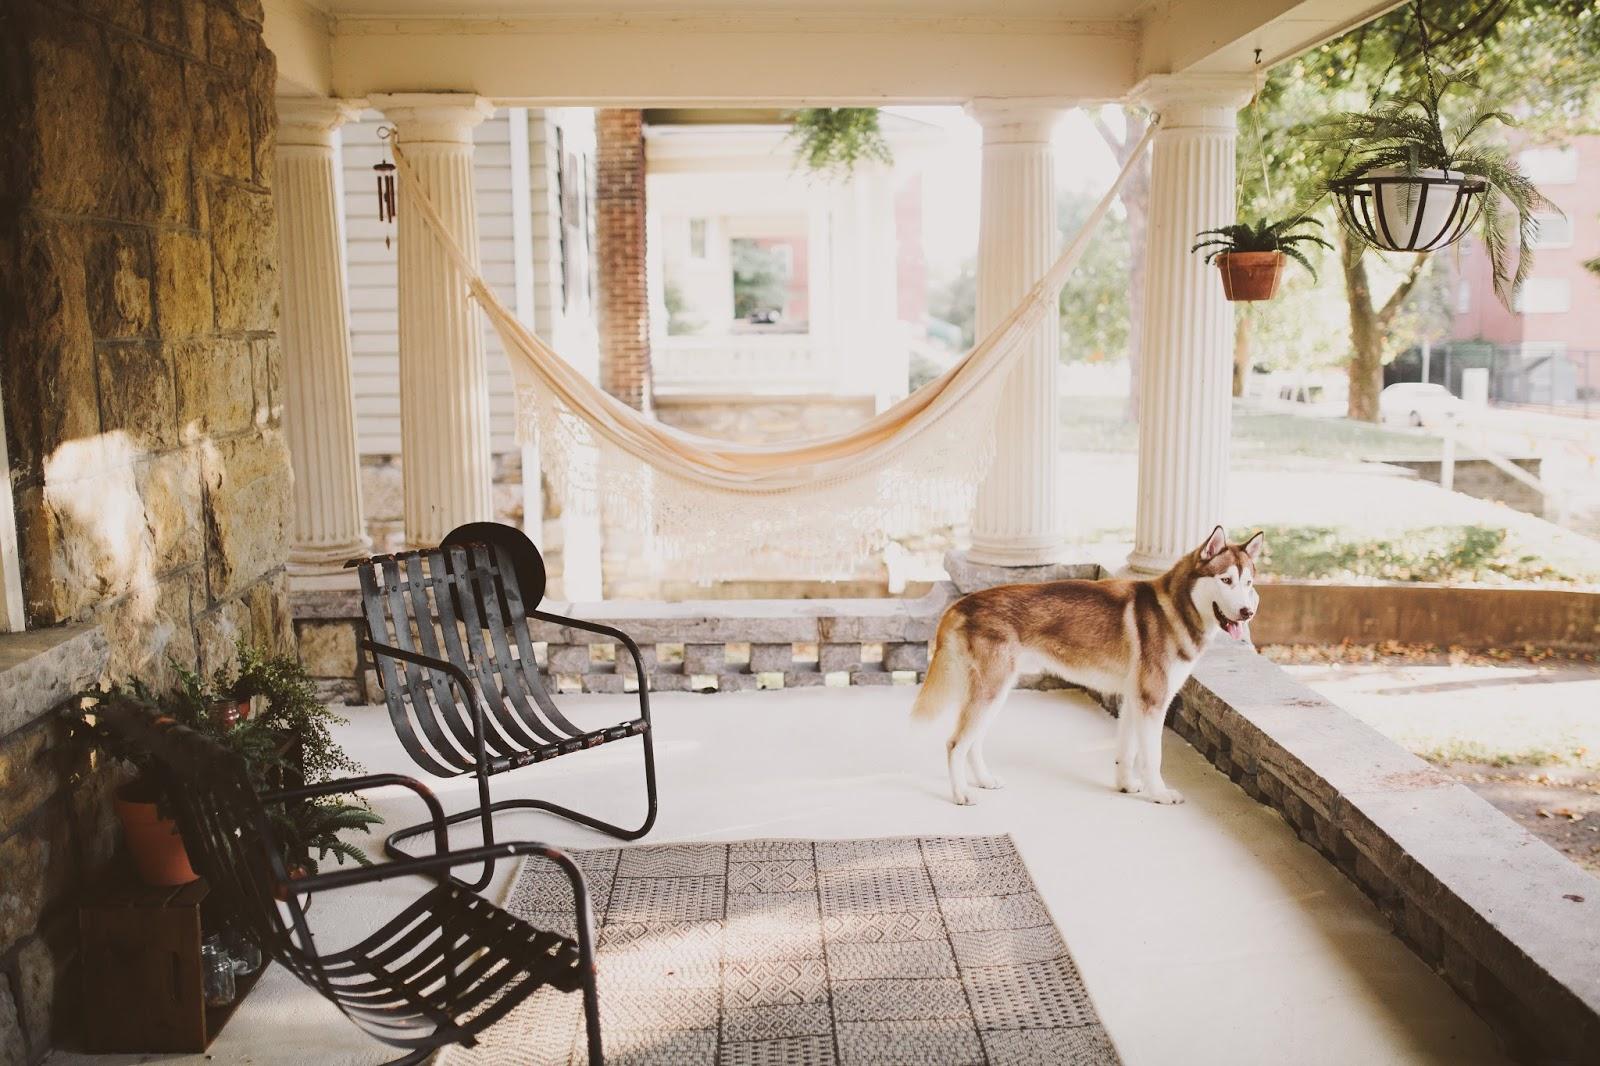 Minimalist-boho-hammock-on-the-front-porch-